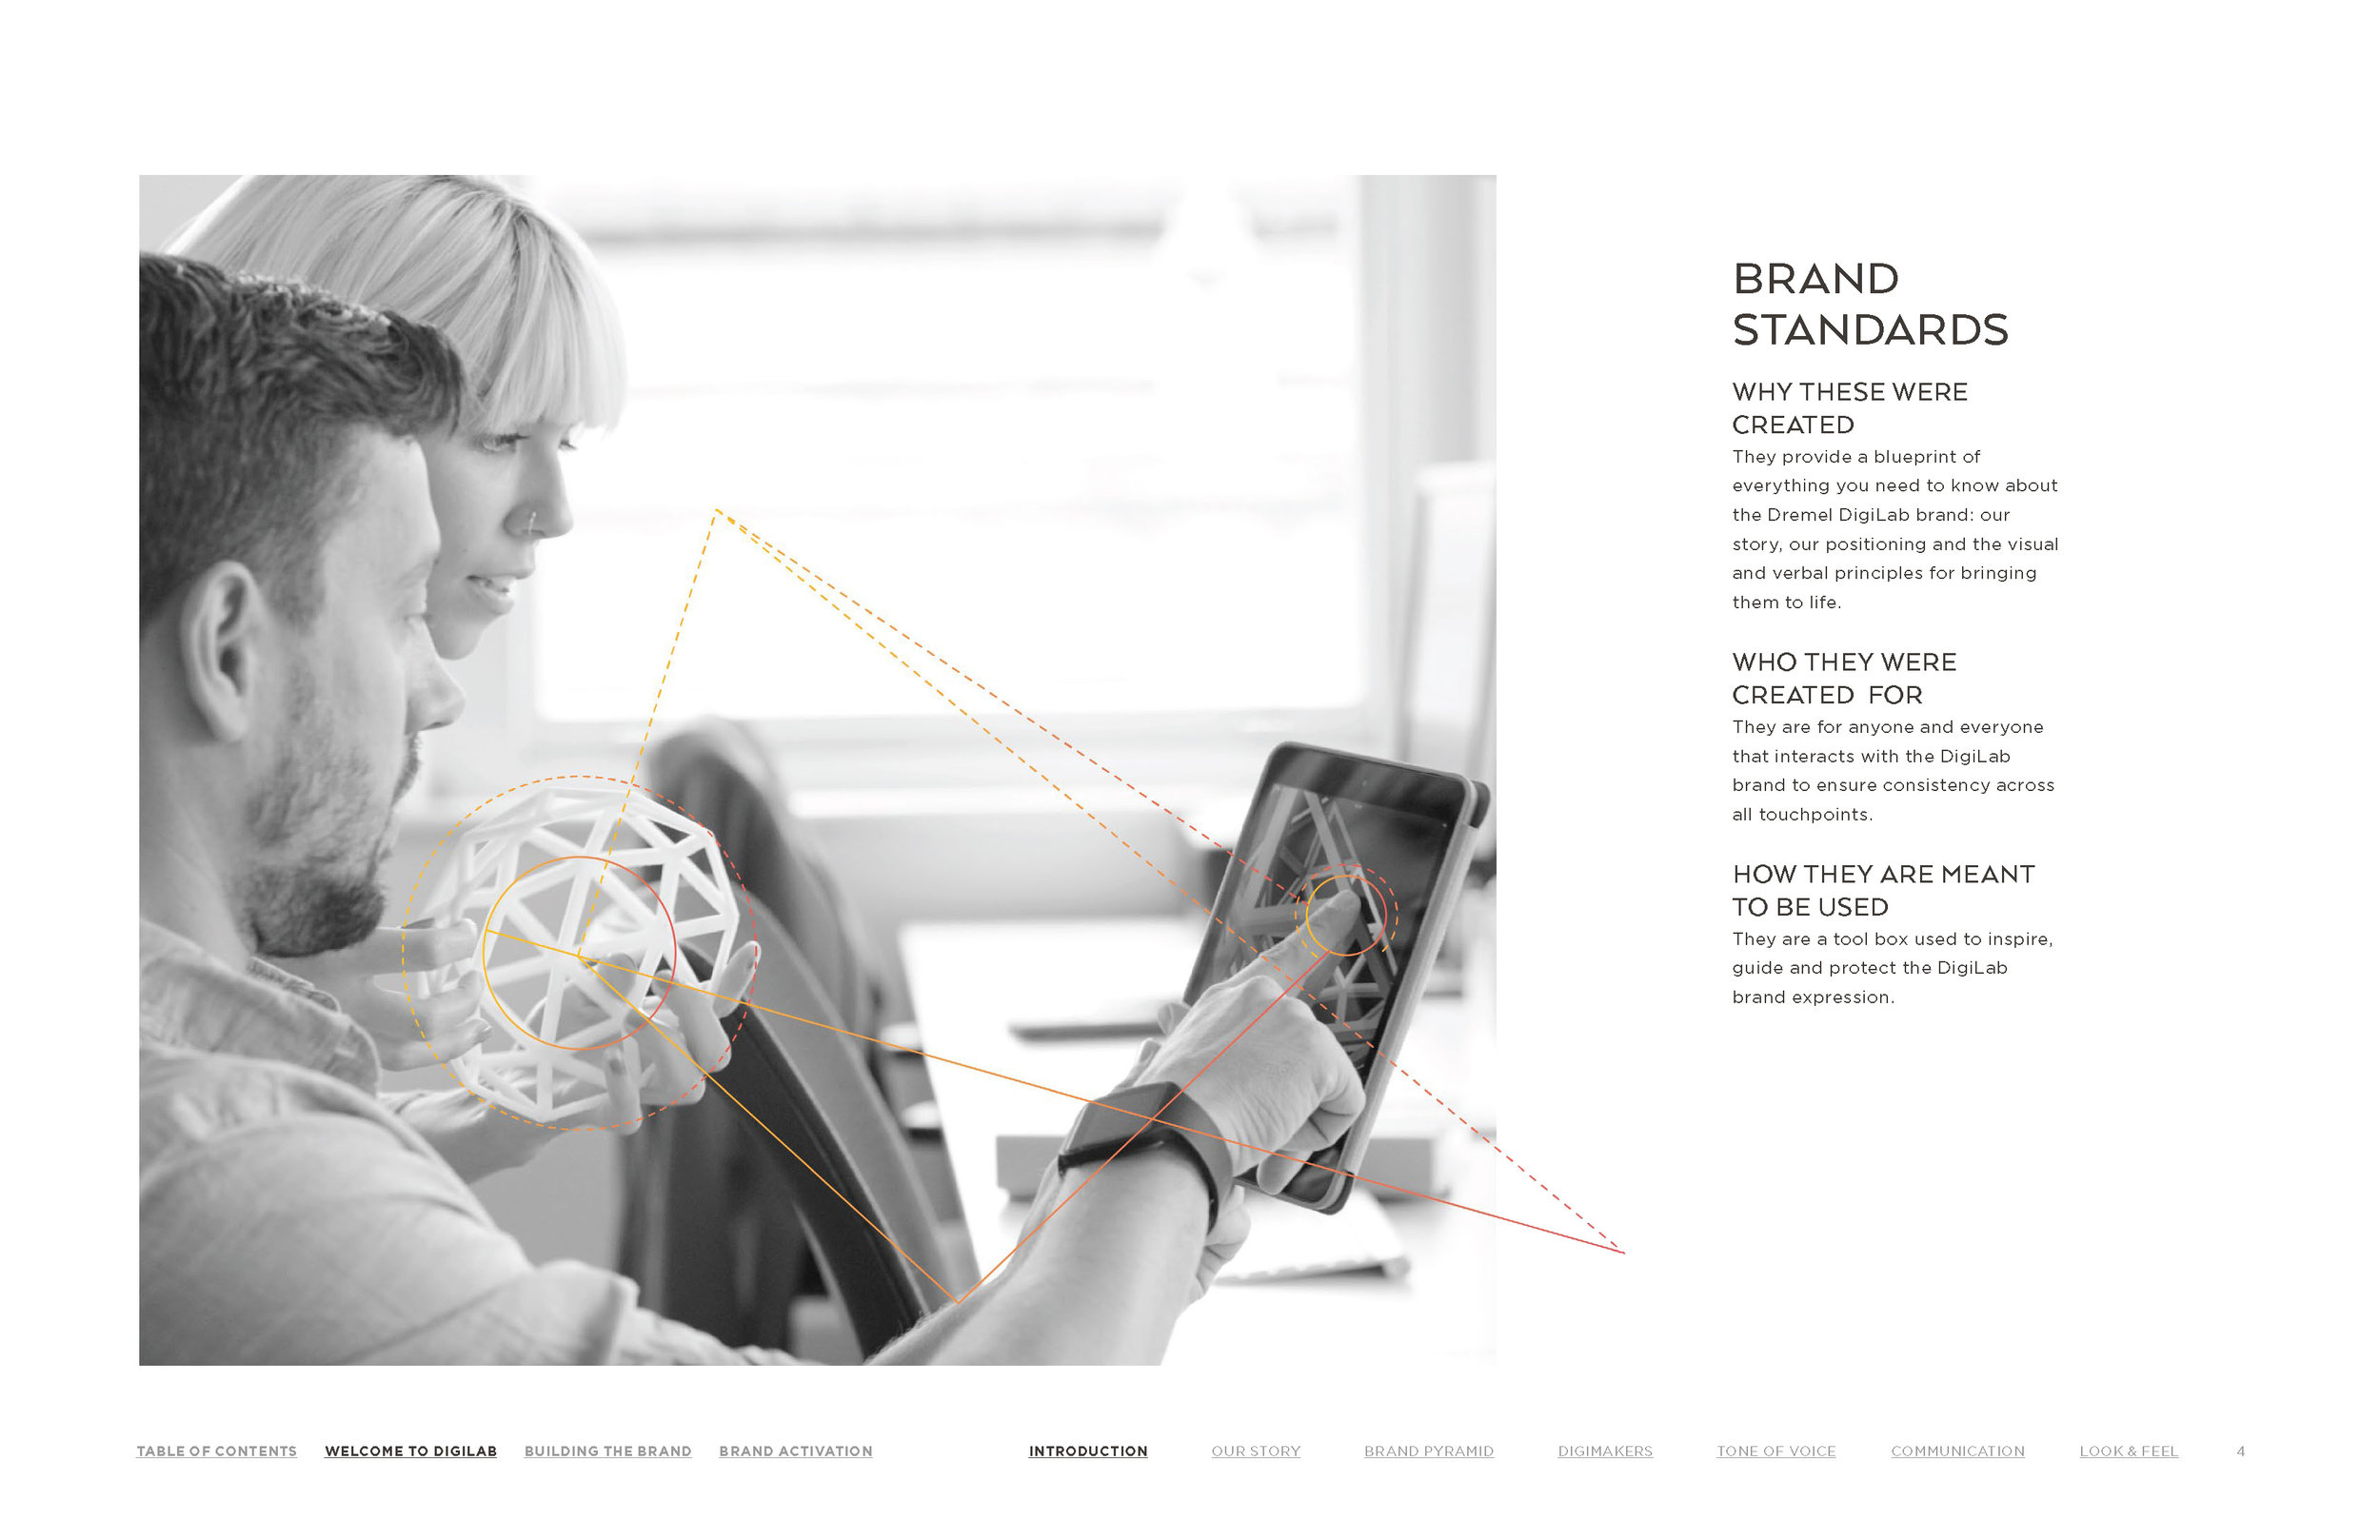 170410_DaVinci_BrandStandards_NL_Page_04.jpg